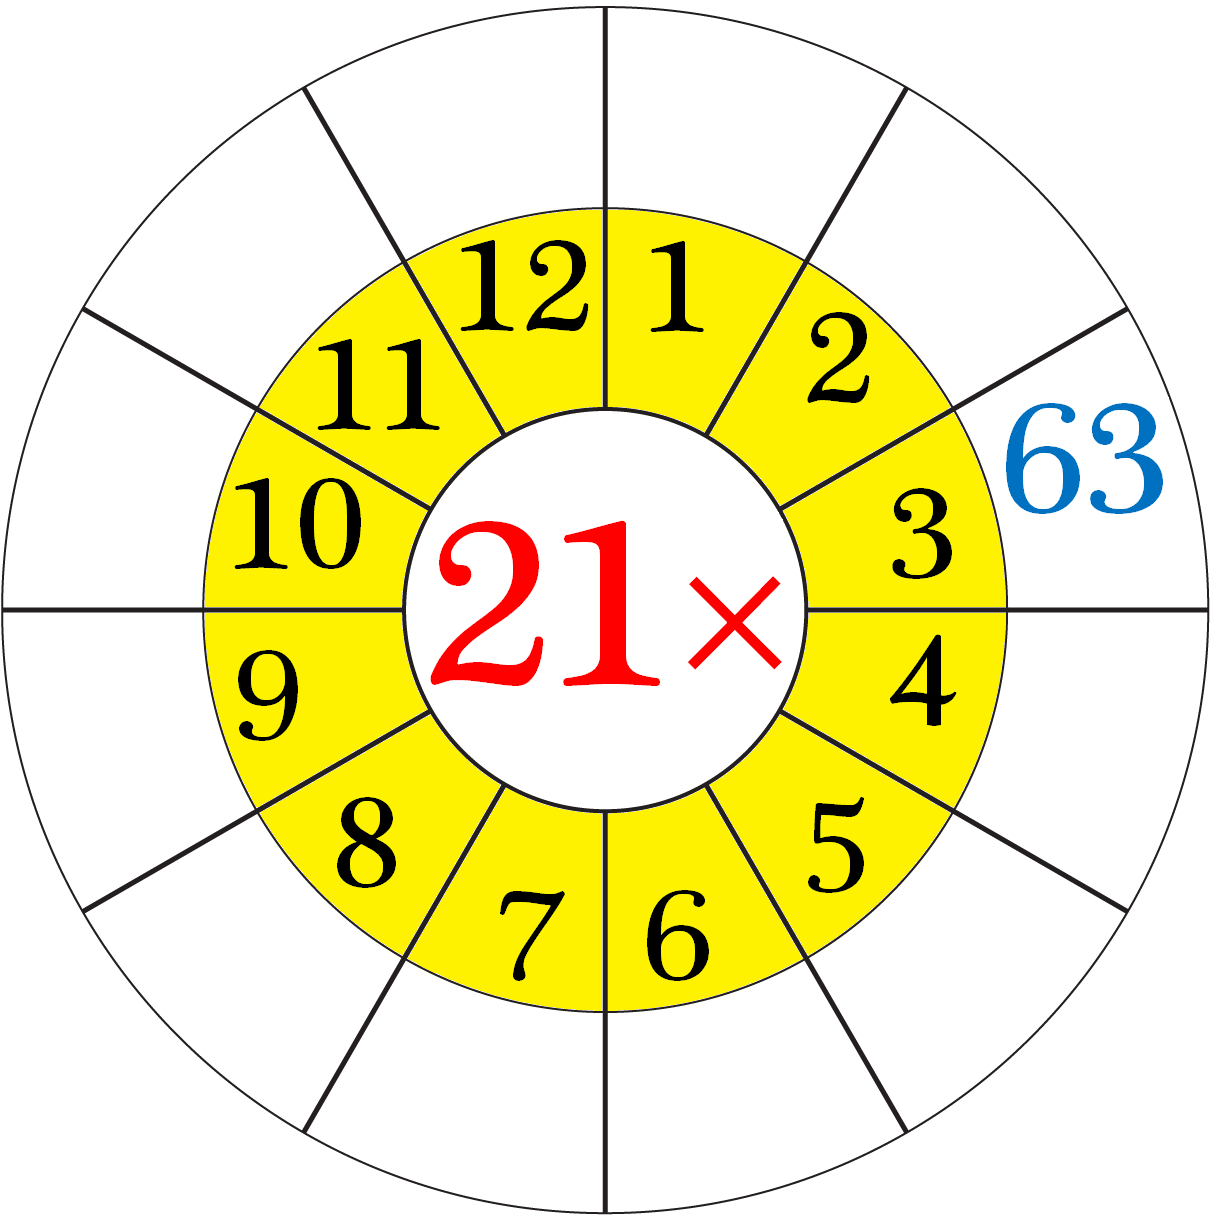 21 Times Multiplication Table Worksheet